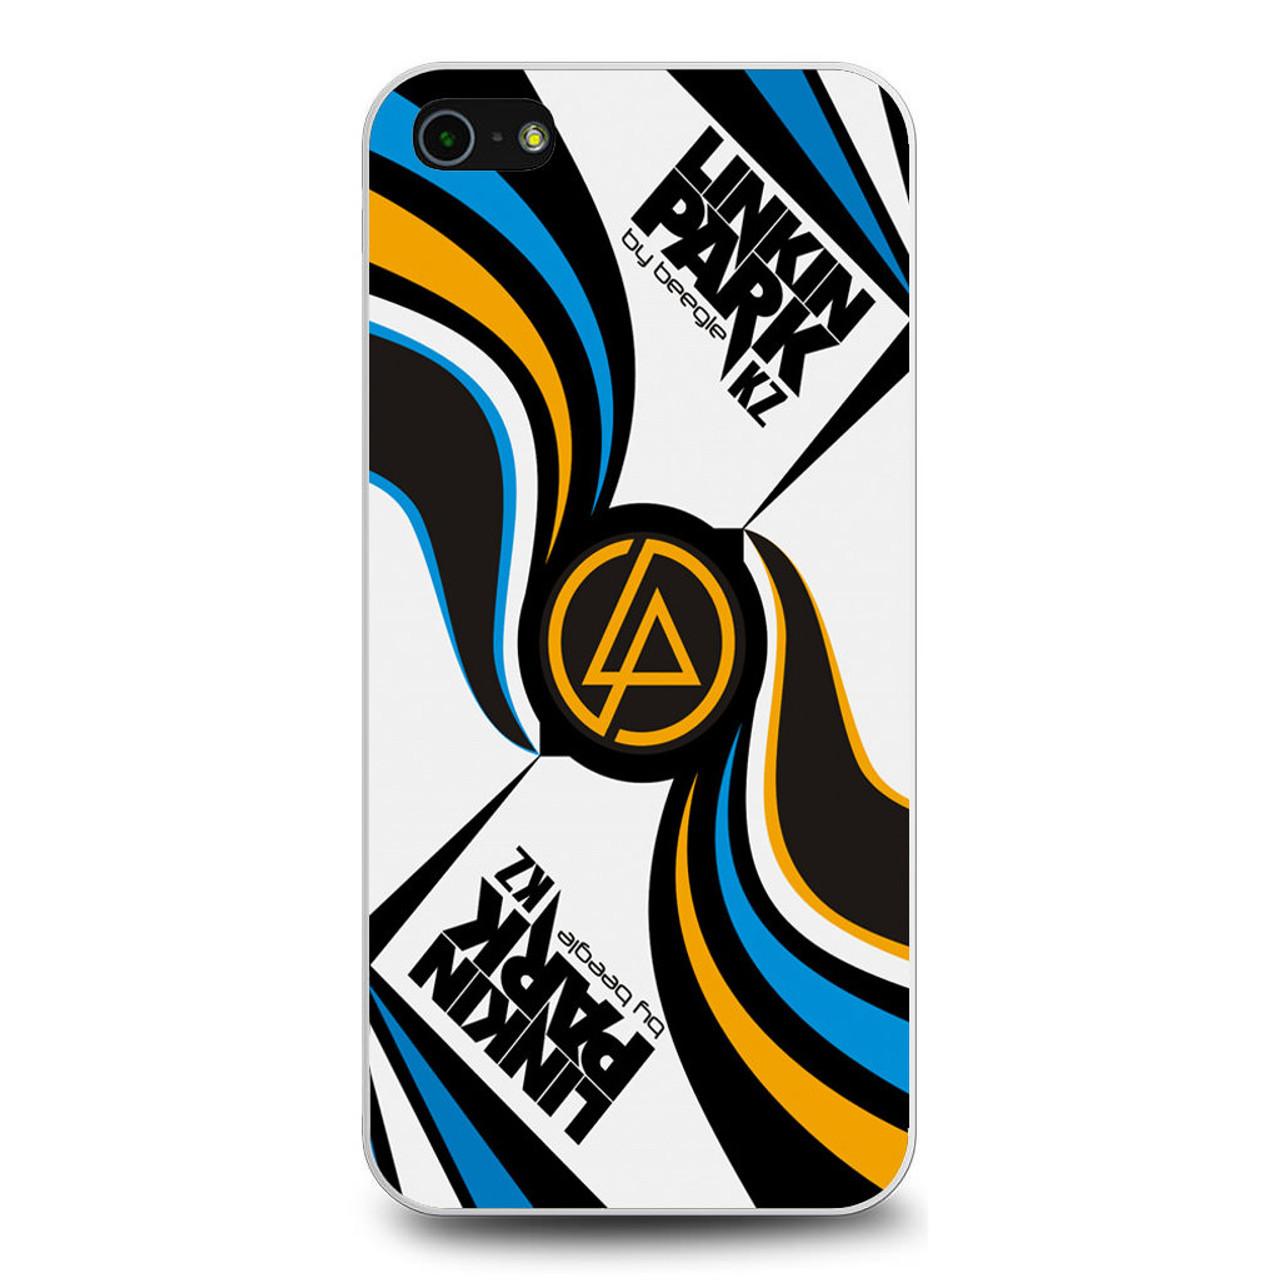 Linkin Park Art Iphone 5 5s Se Case